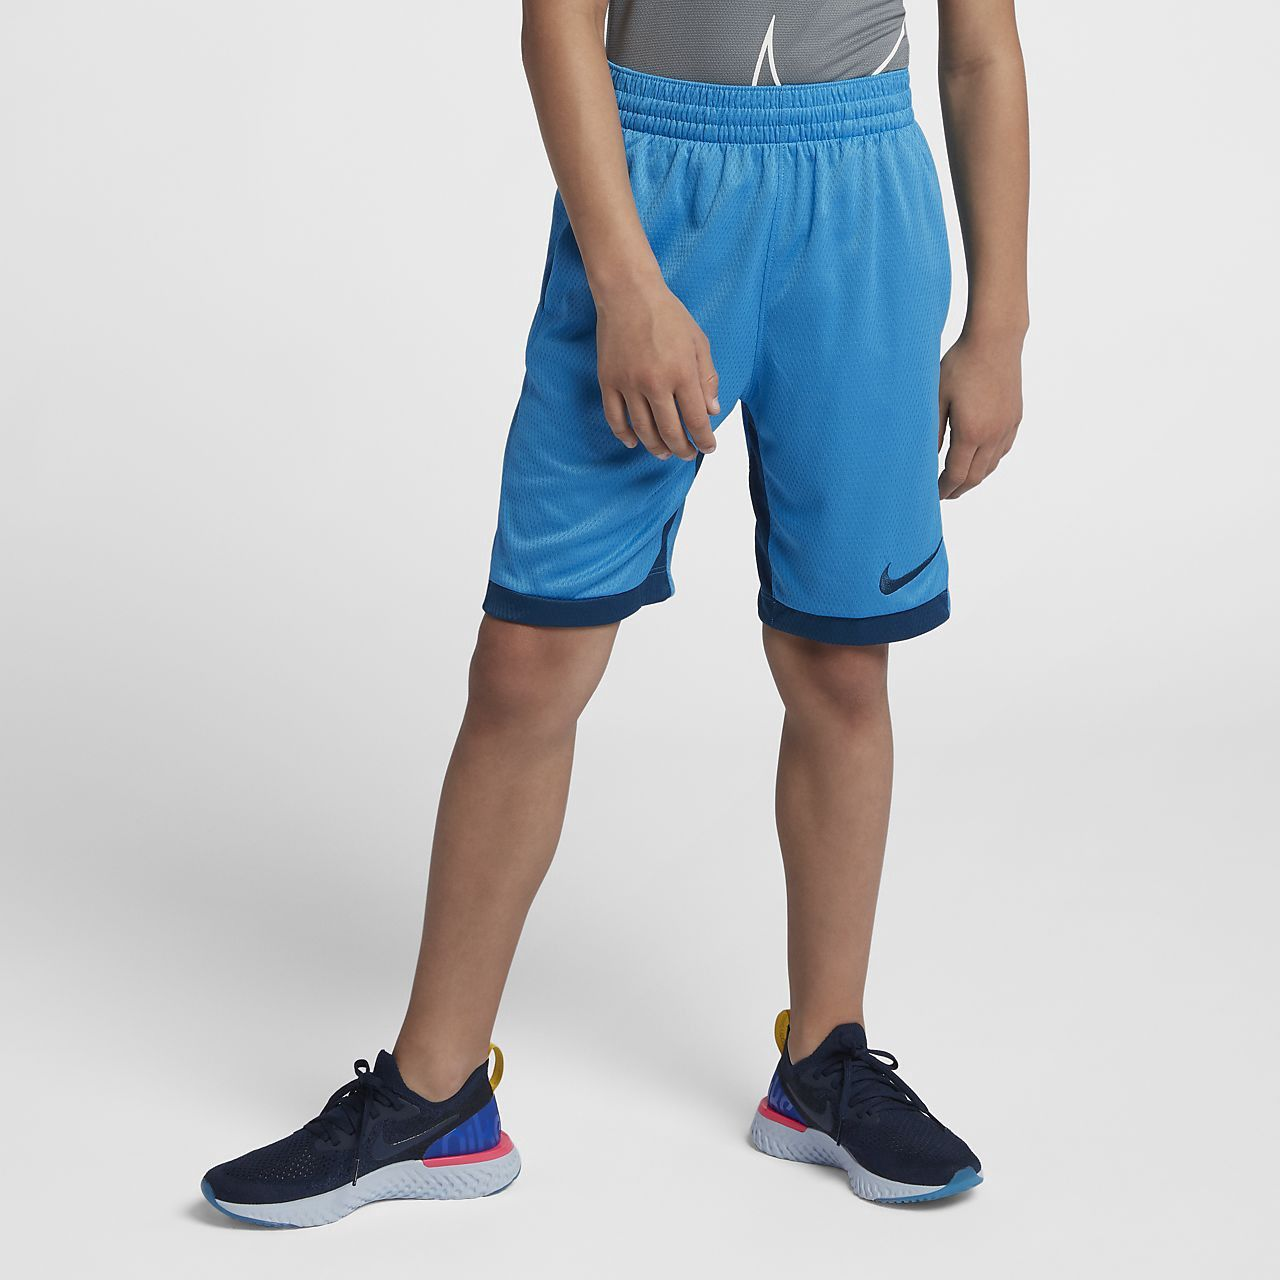 a087b4876d3a Nike Dri-FIT Trophy Big Kids  (Boys ) Training Shorts by Nike ...